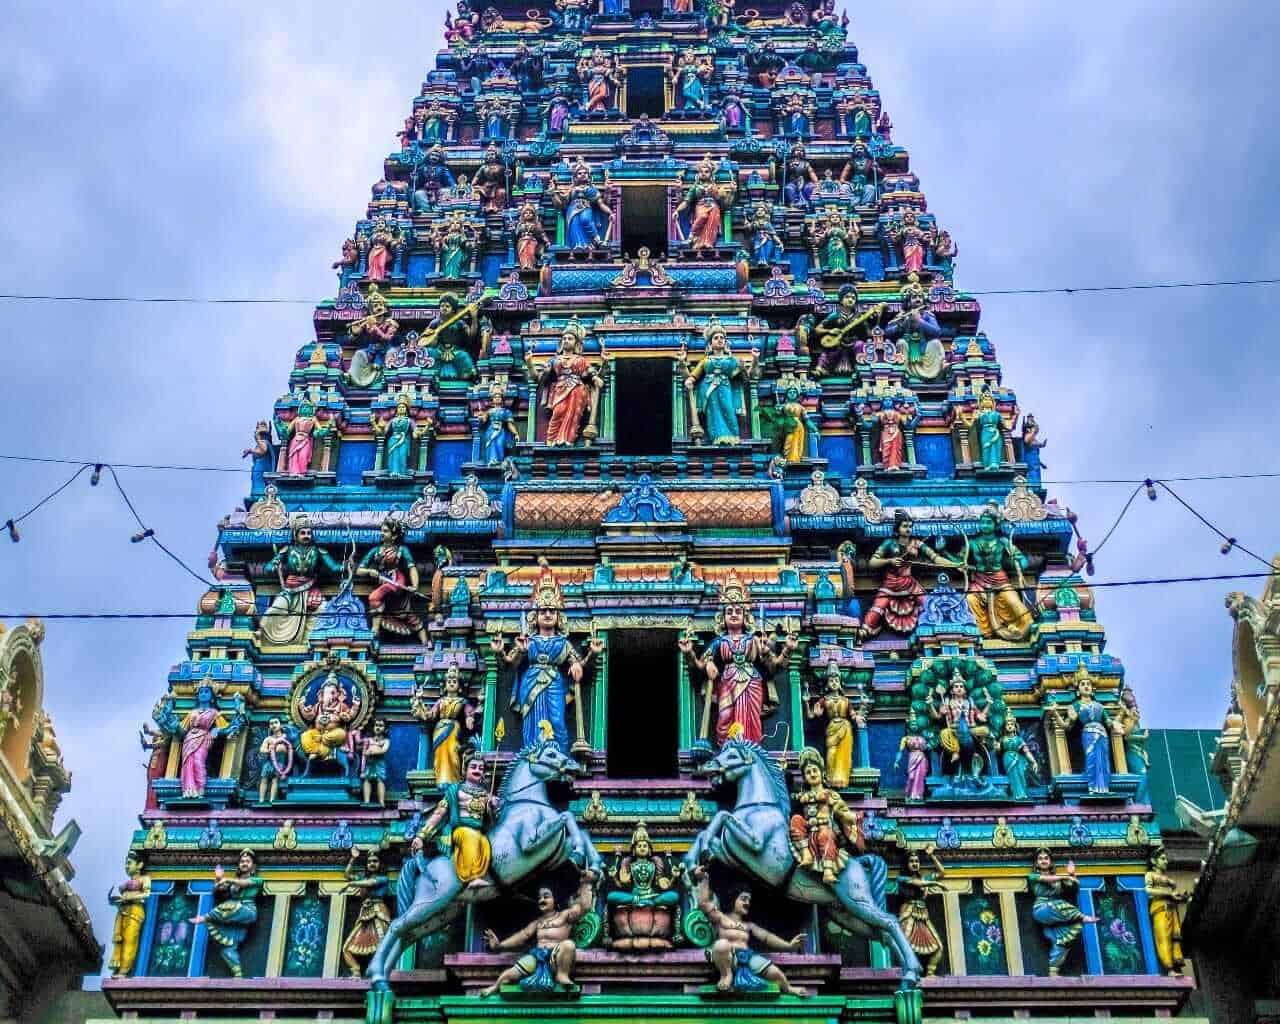 Mahamariamman Temple, Kuala Lumpur, Malaysia